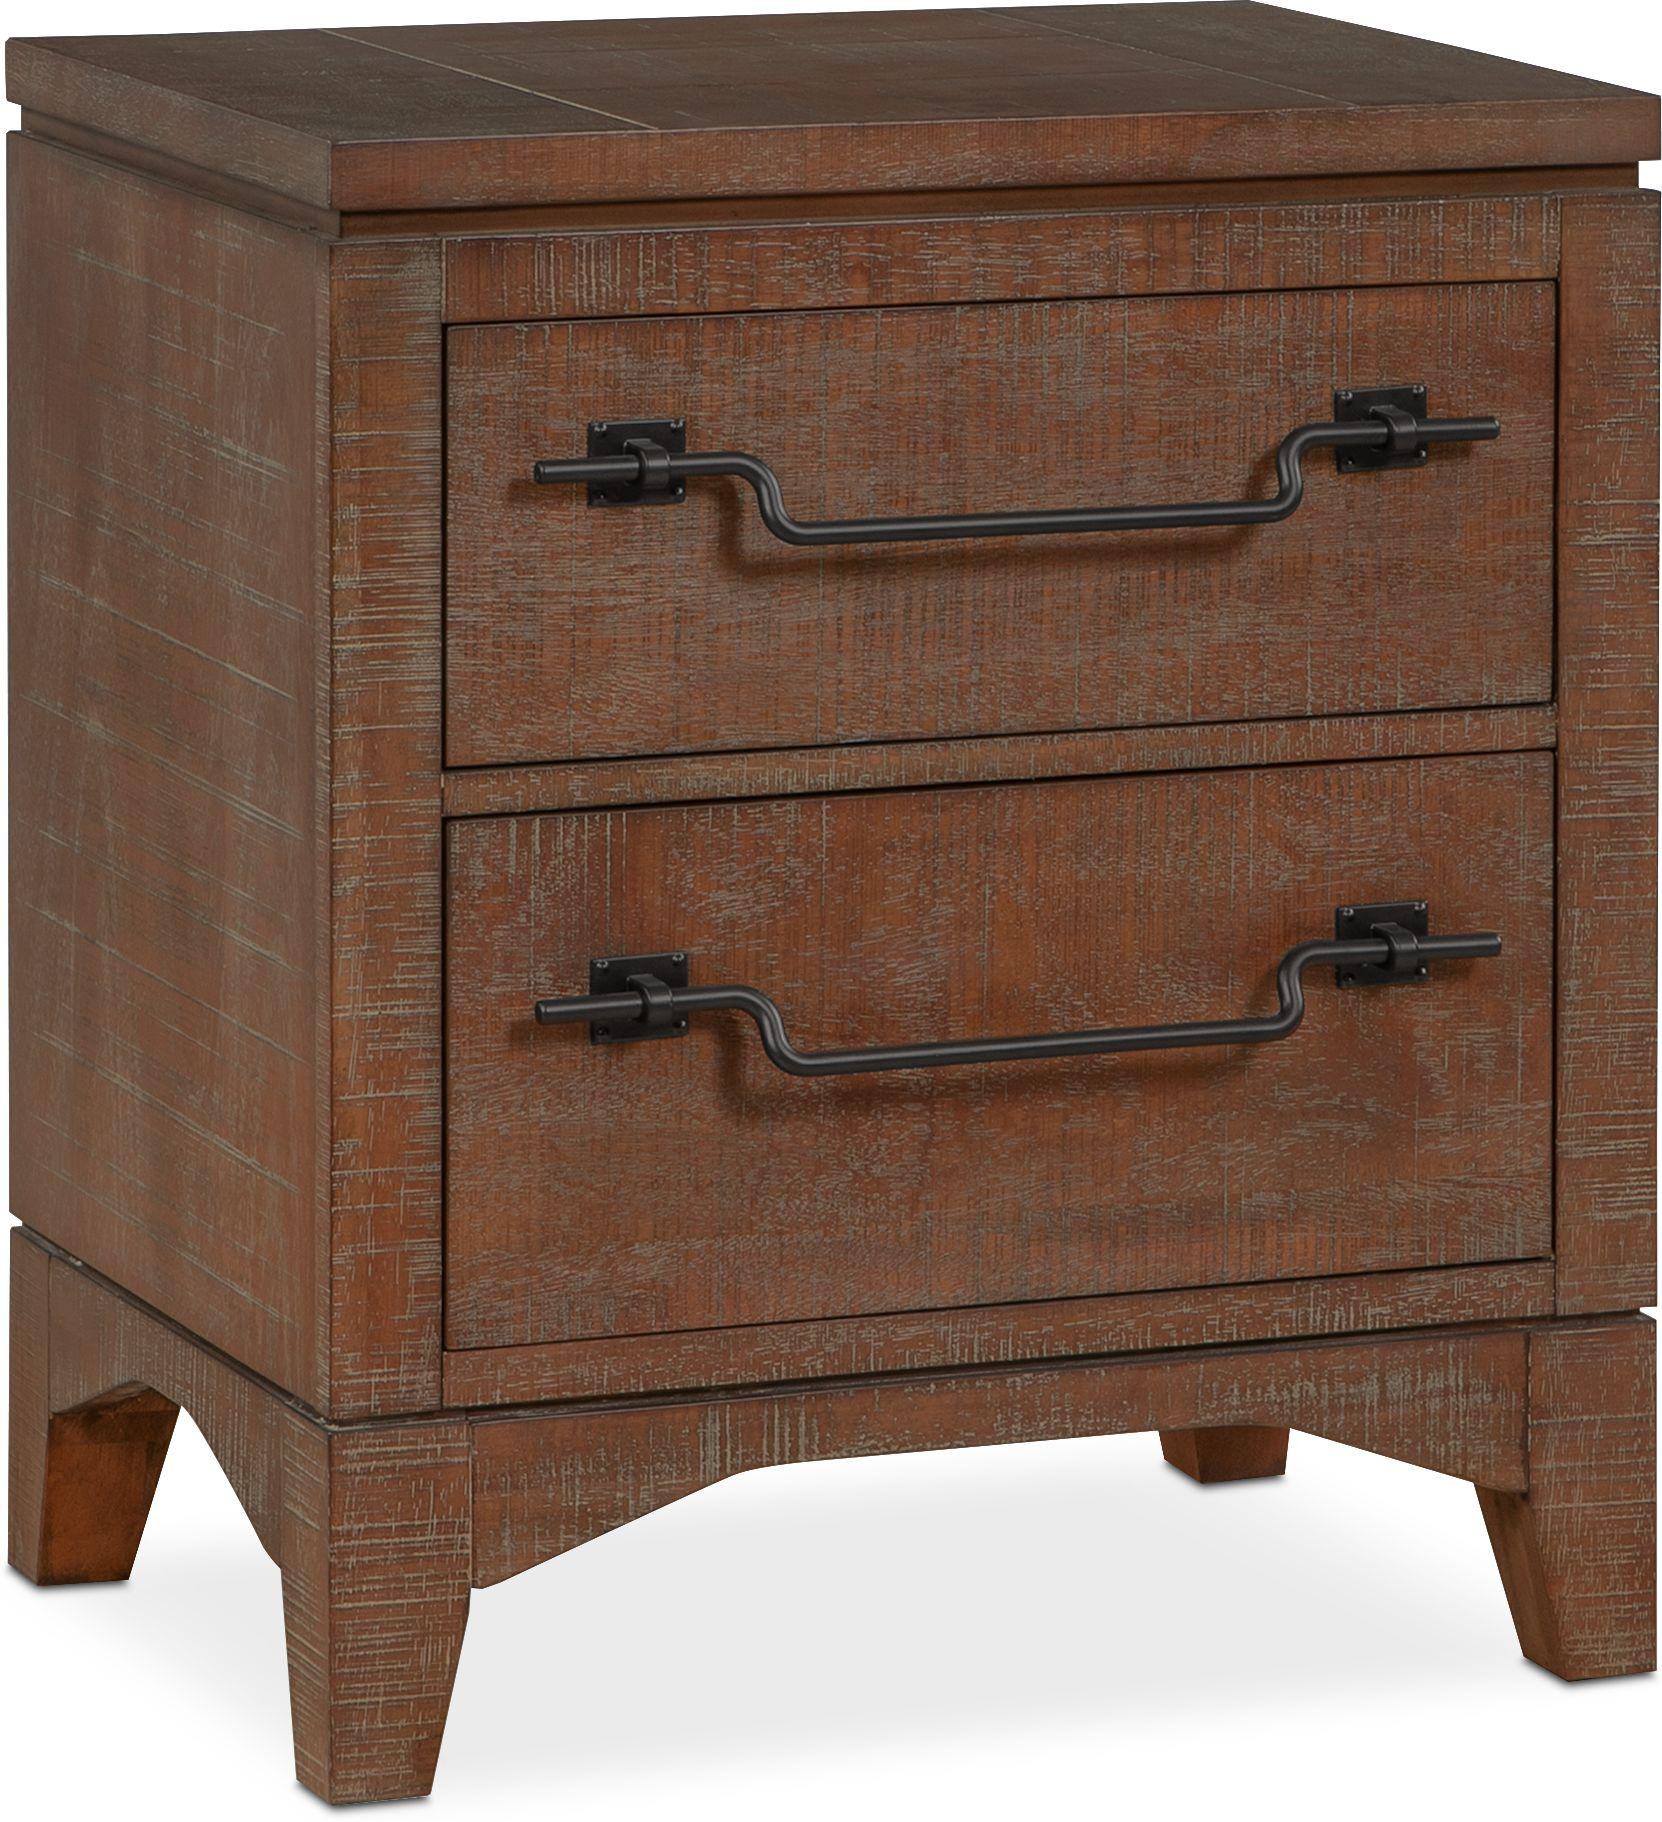 Bedroom Furniture - Gristmill Nightstand